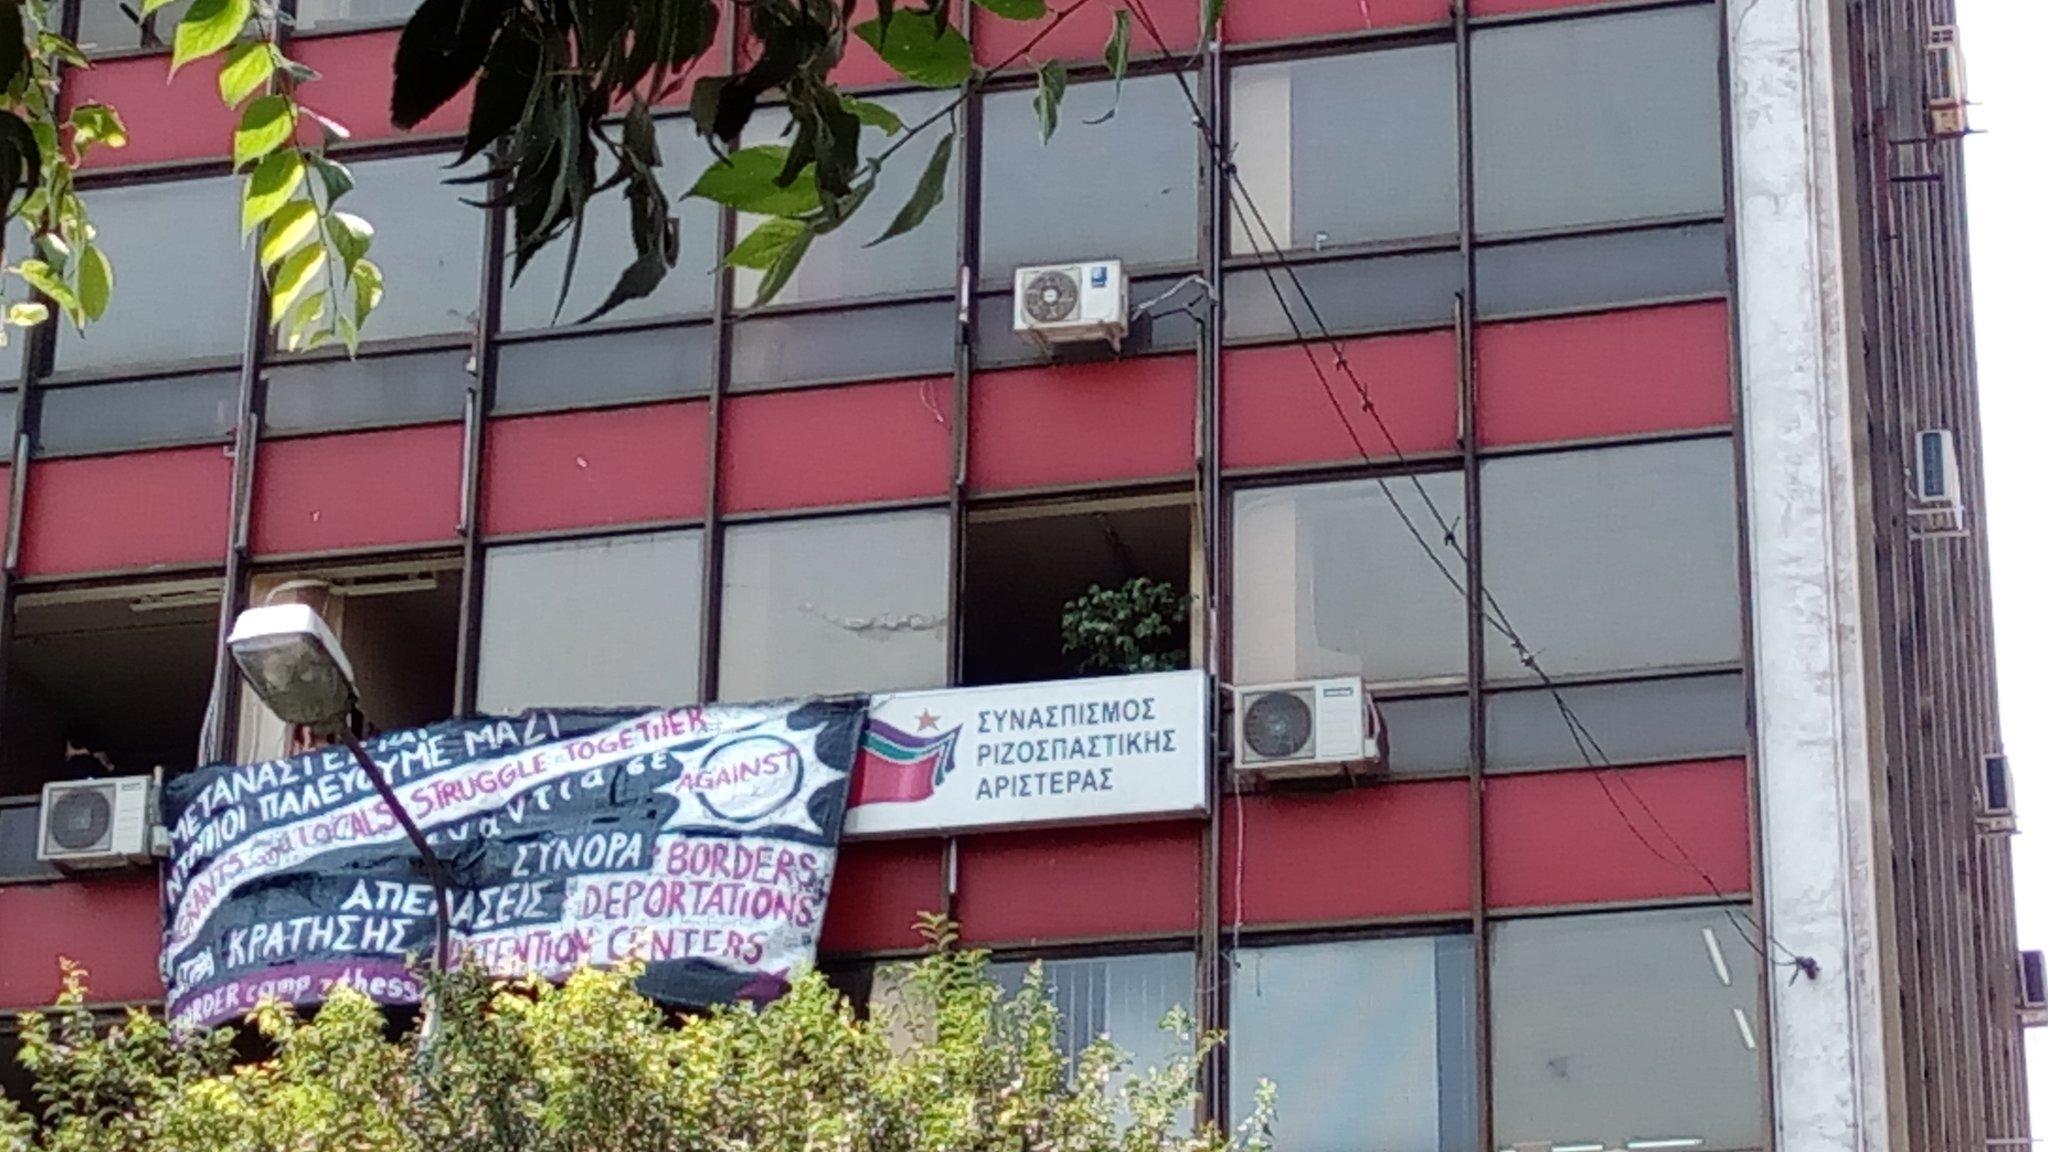 Oficinas de Syriza en Tesalónica.